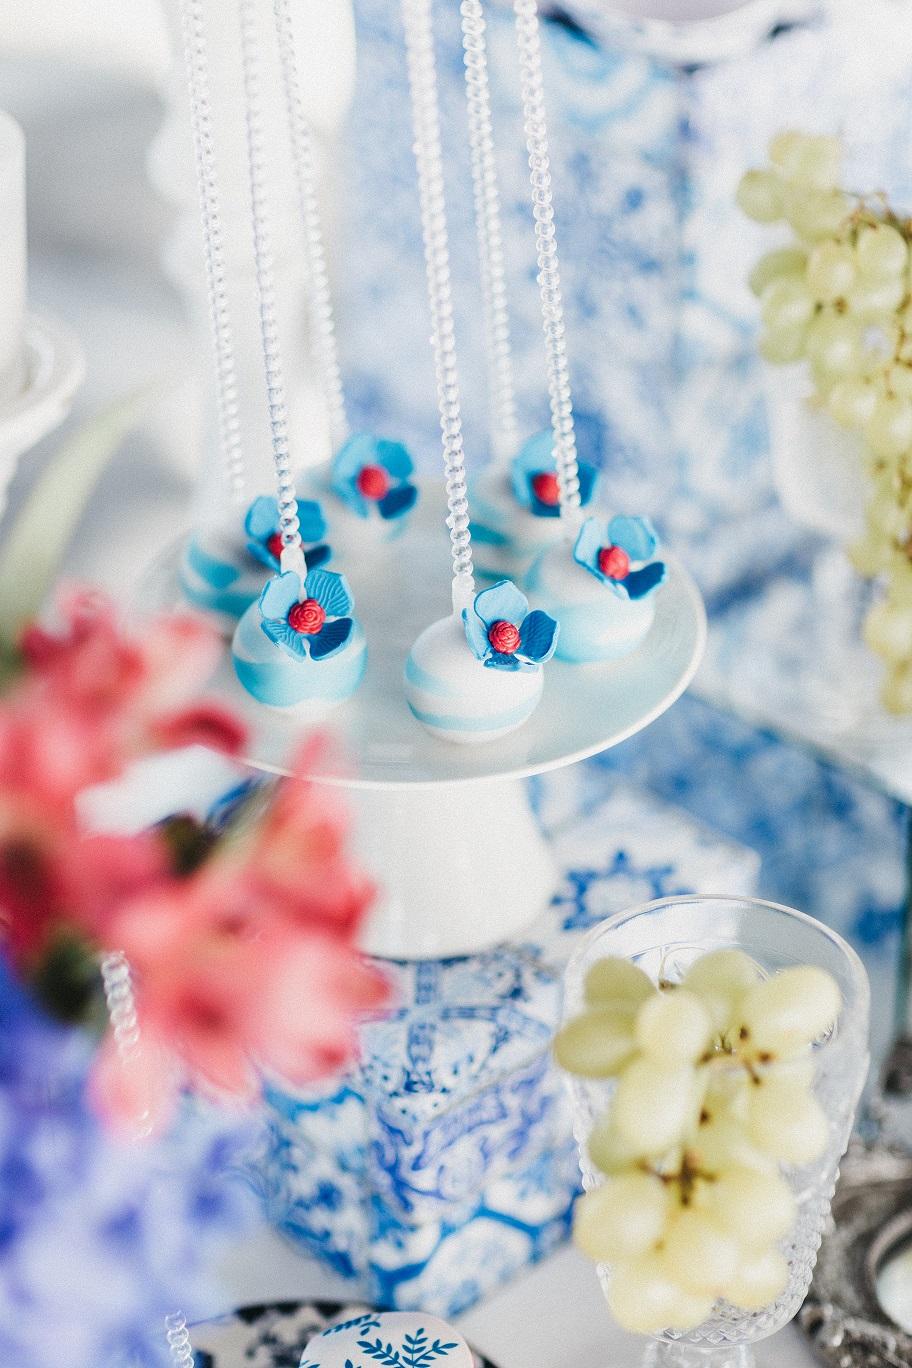 Blue Inspired Wedding in Kythnos designed by Tsveta Christou